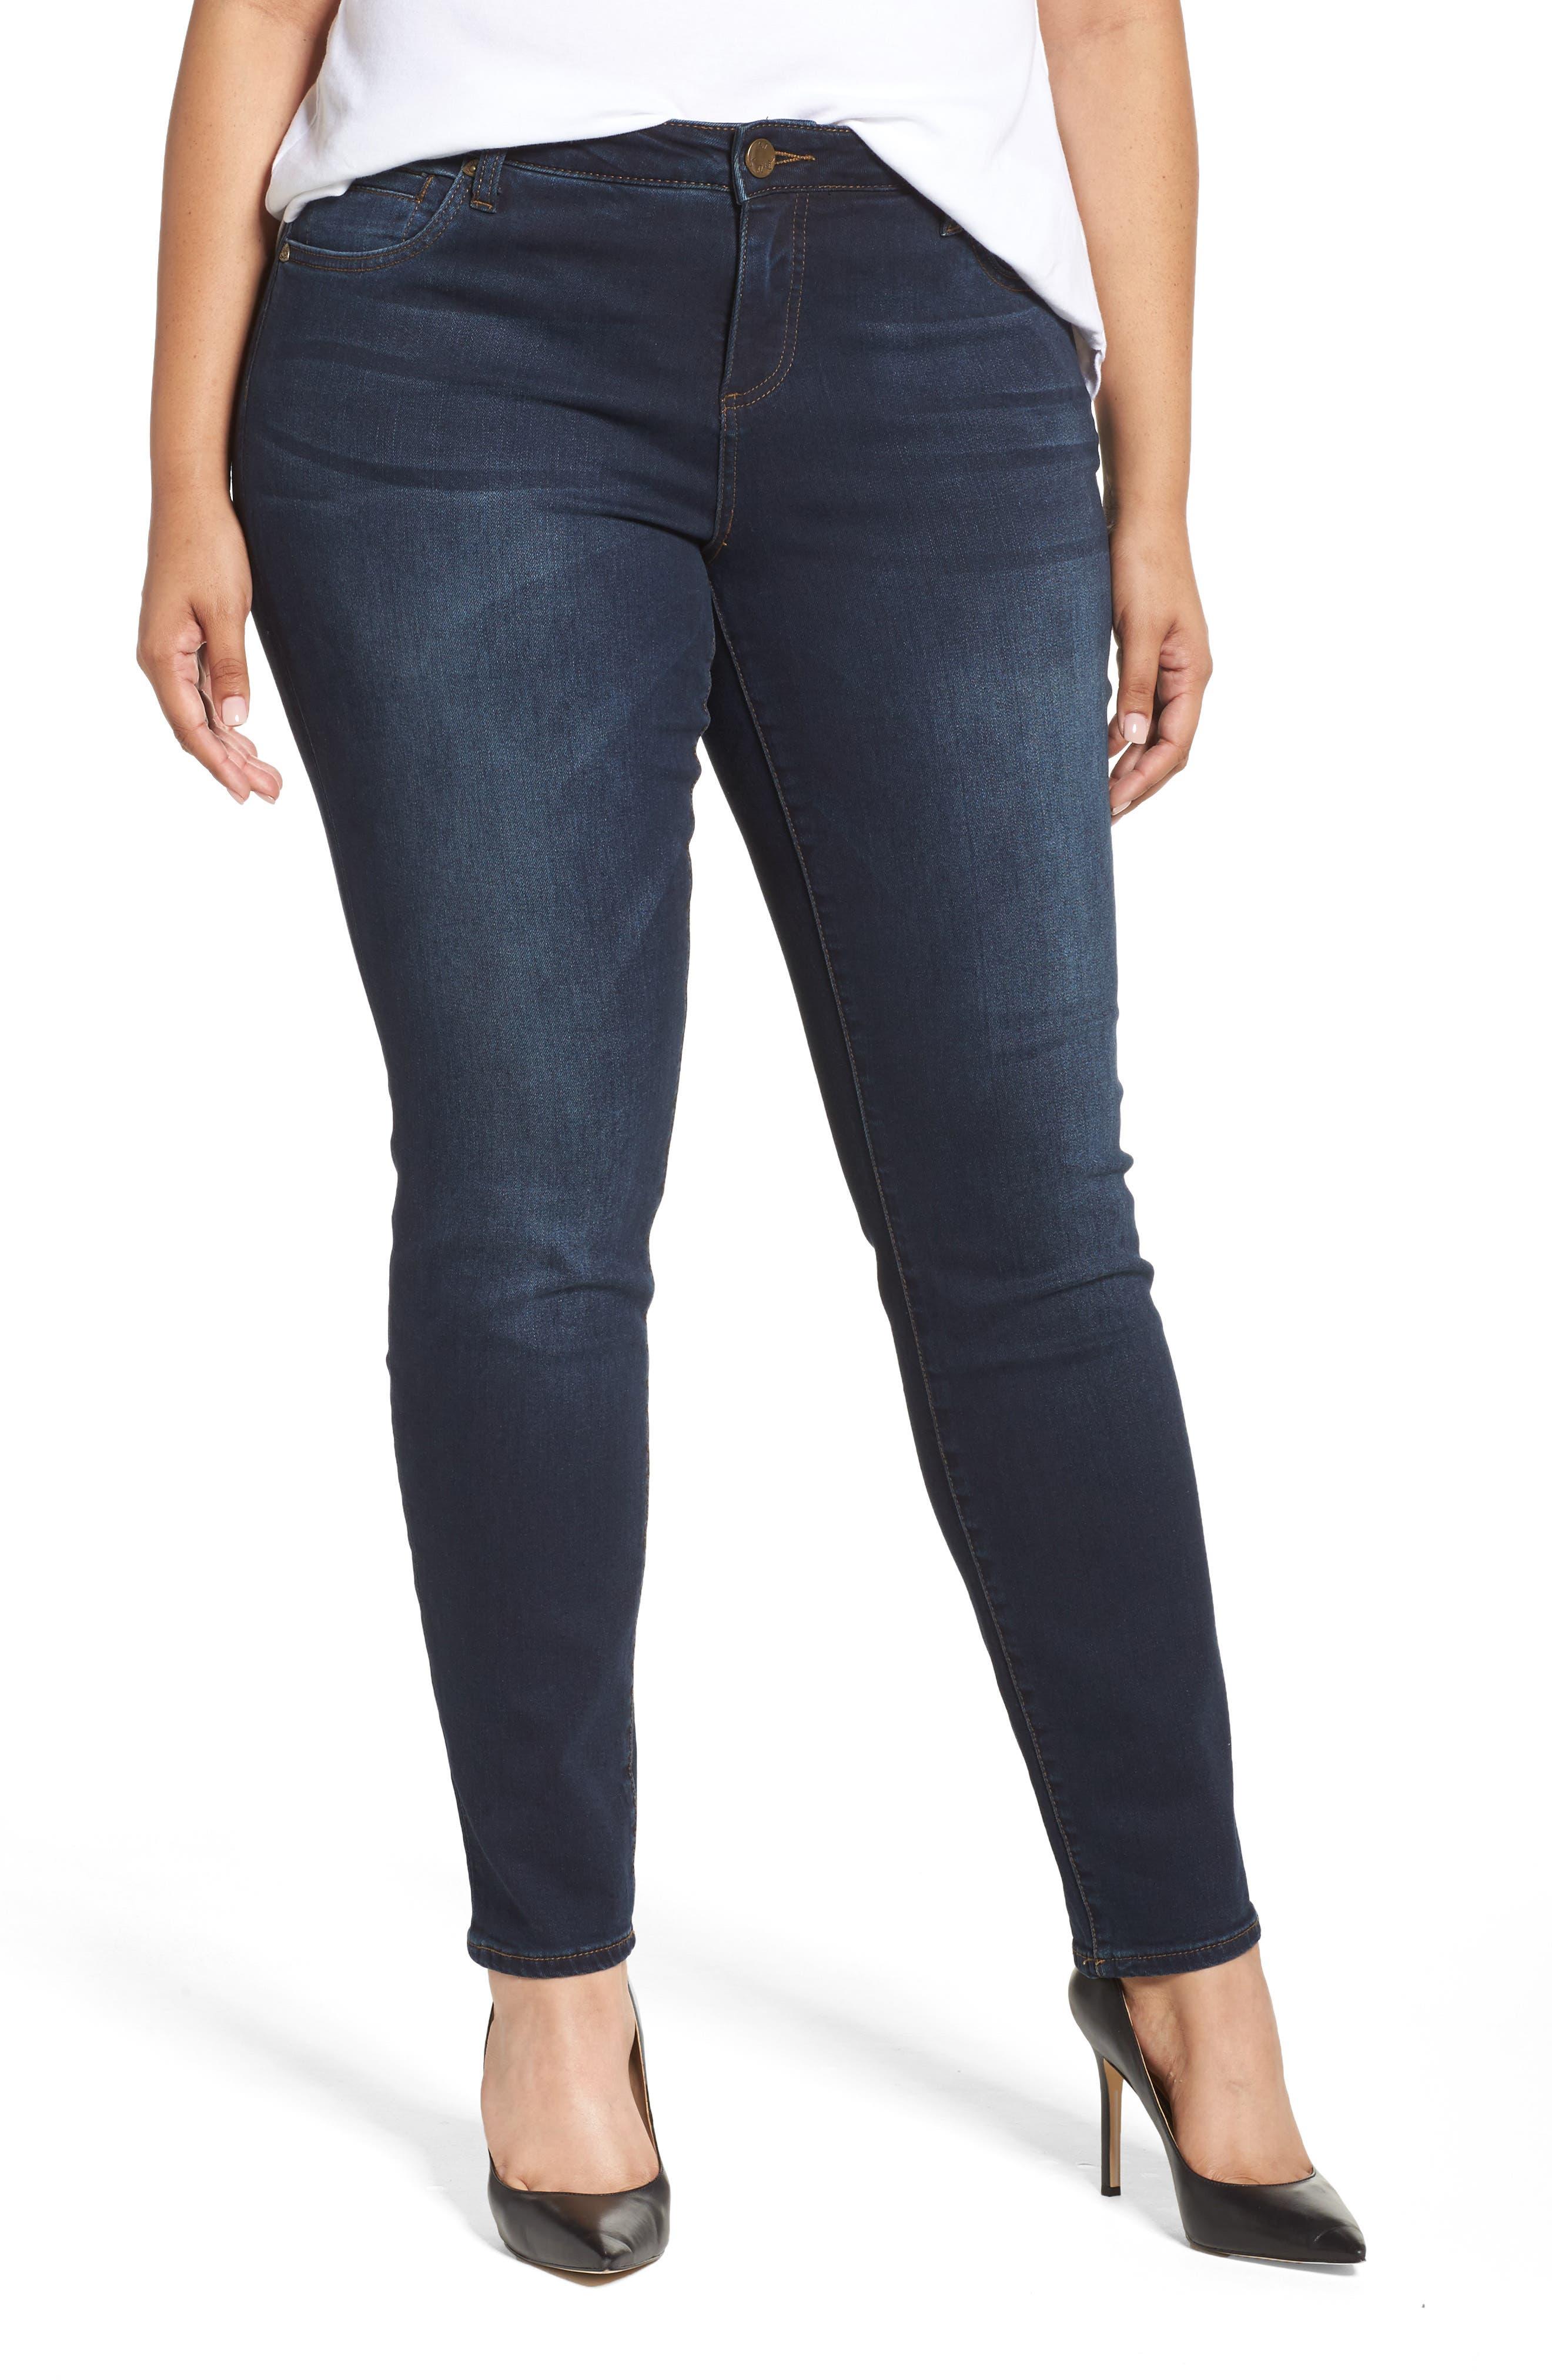 Diana Skinny Jeans,                             Main thumbnail 1, color,                             BREEZY W/ DARK STONE BASE WASH